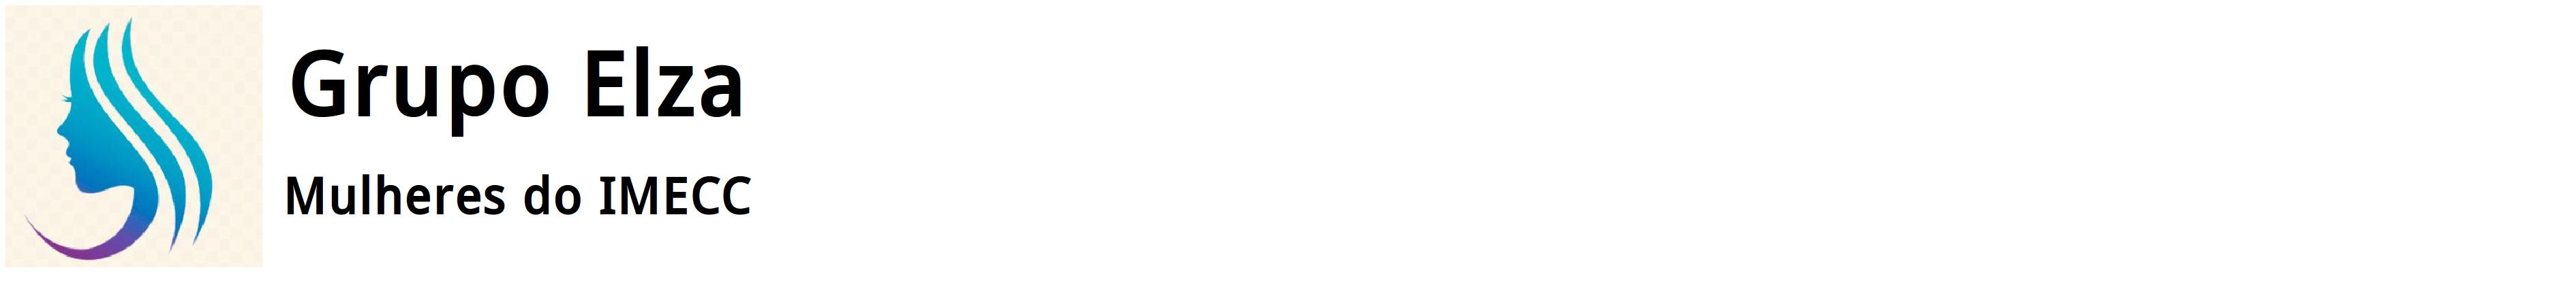 Grupo Elza